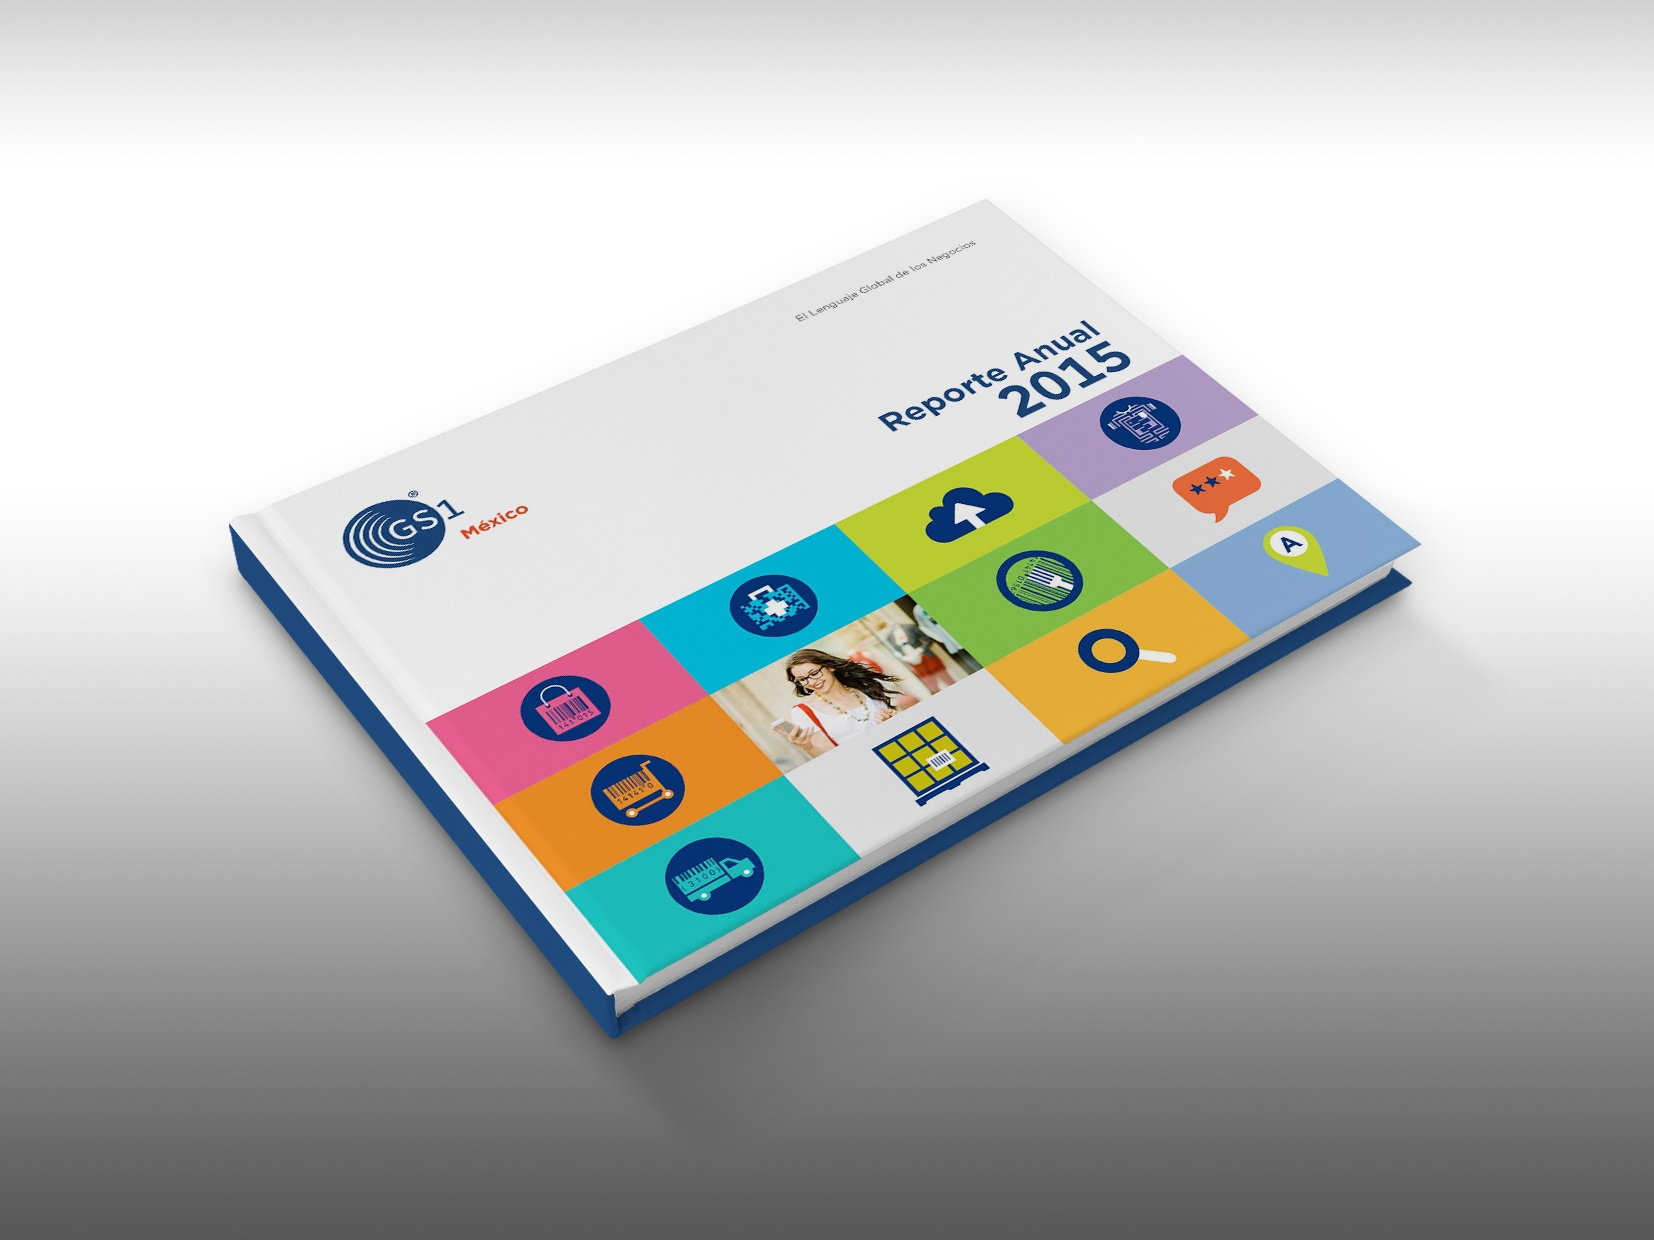 Reporte anual GS1 2013